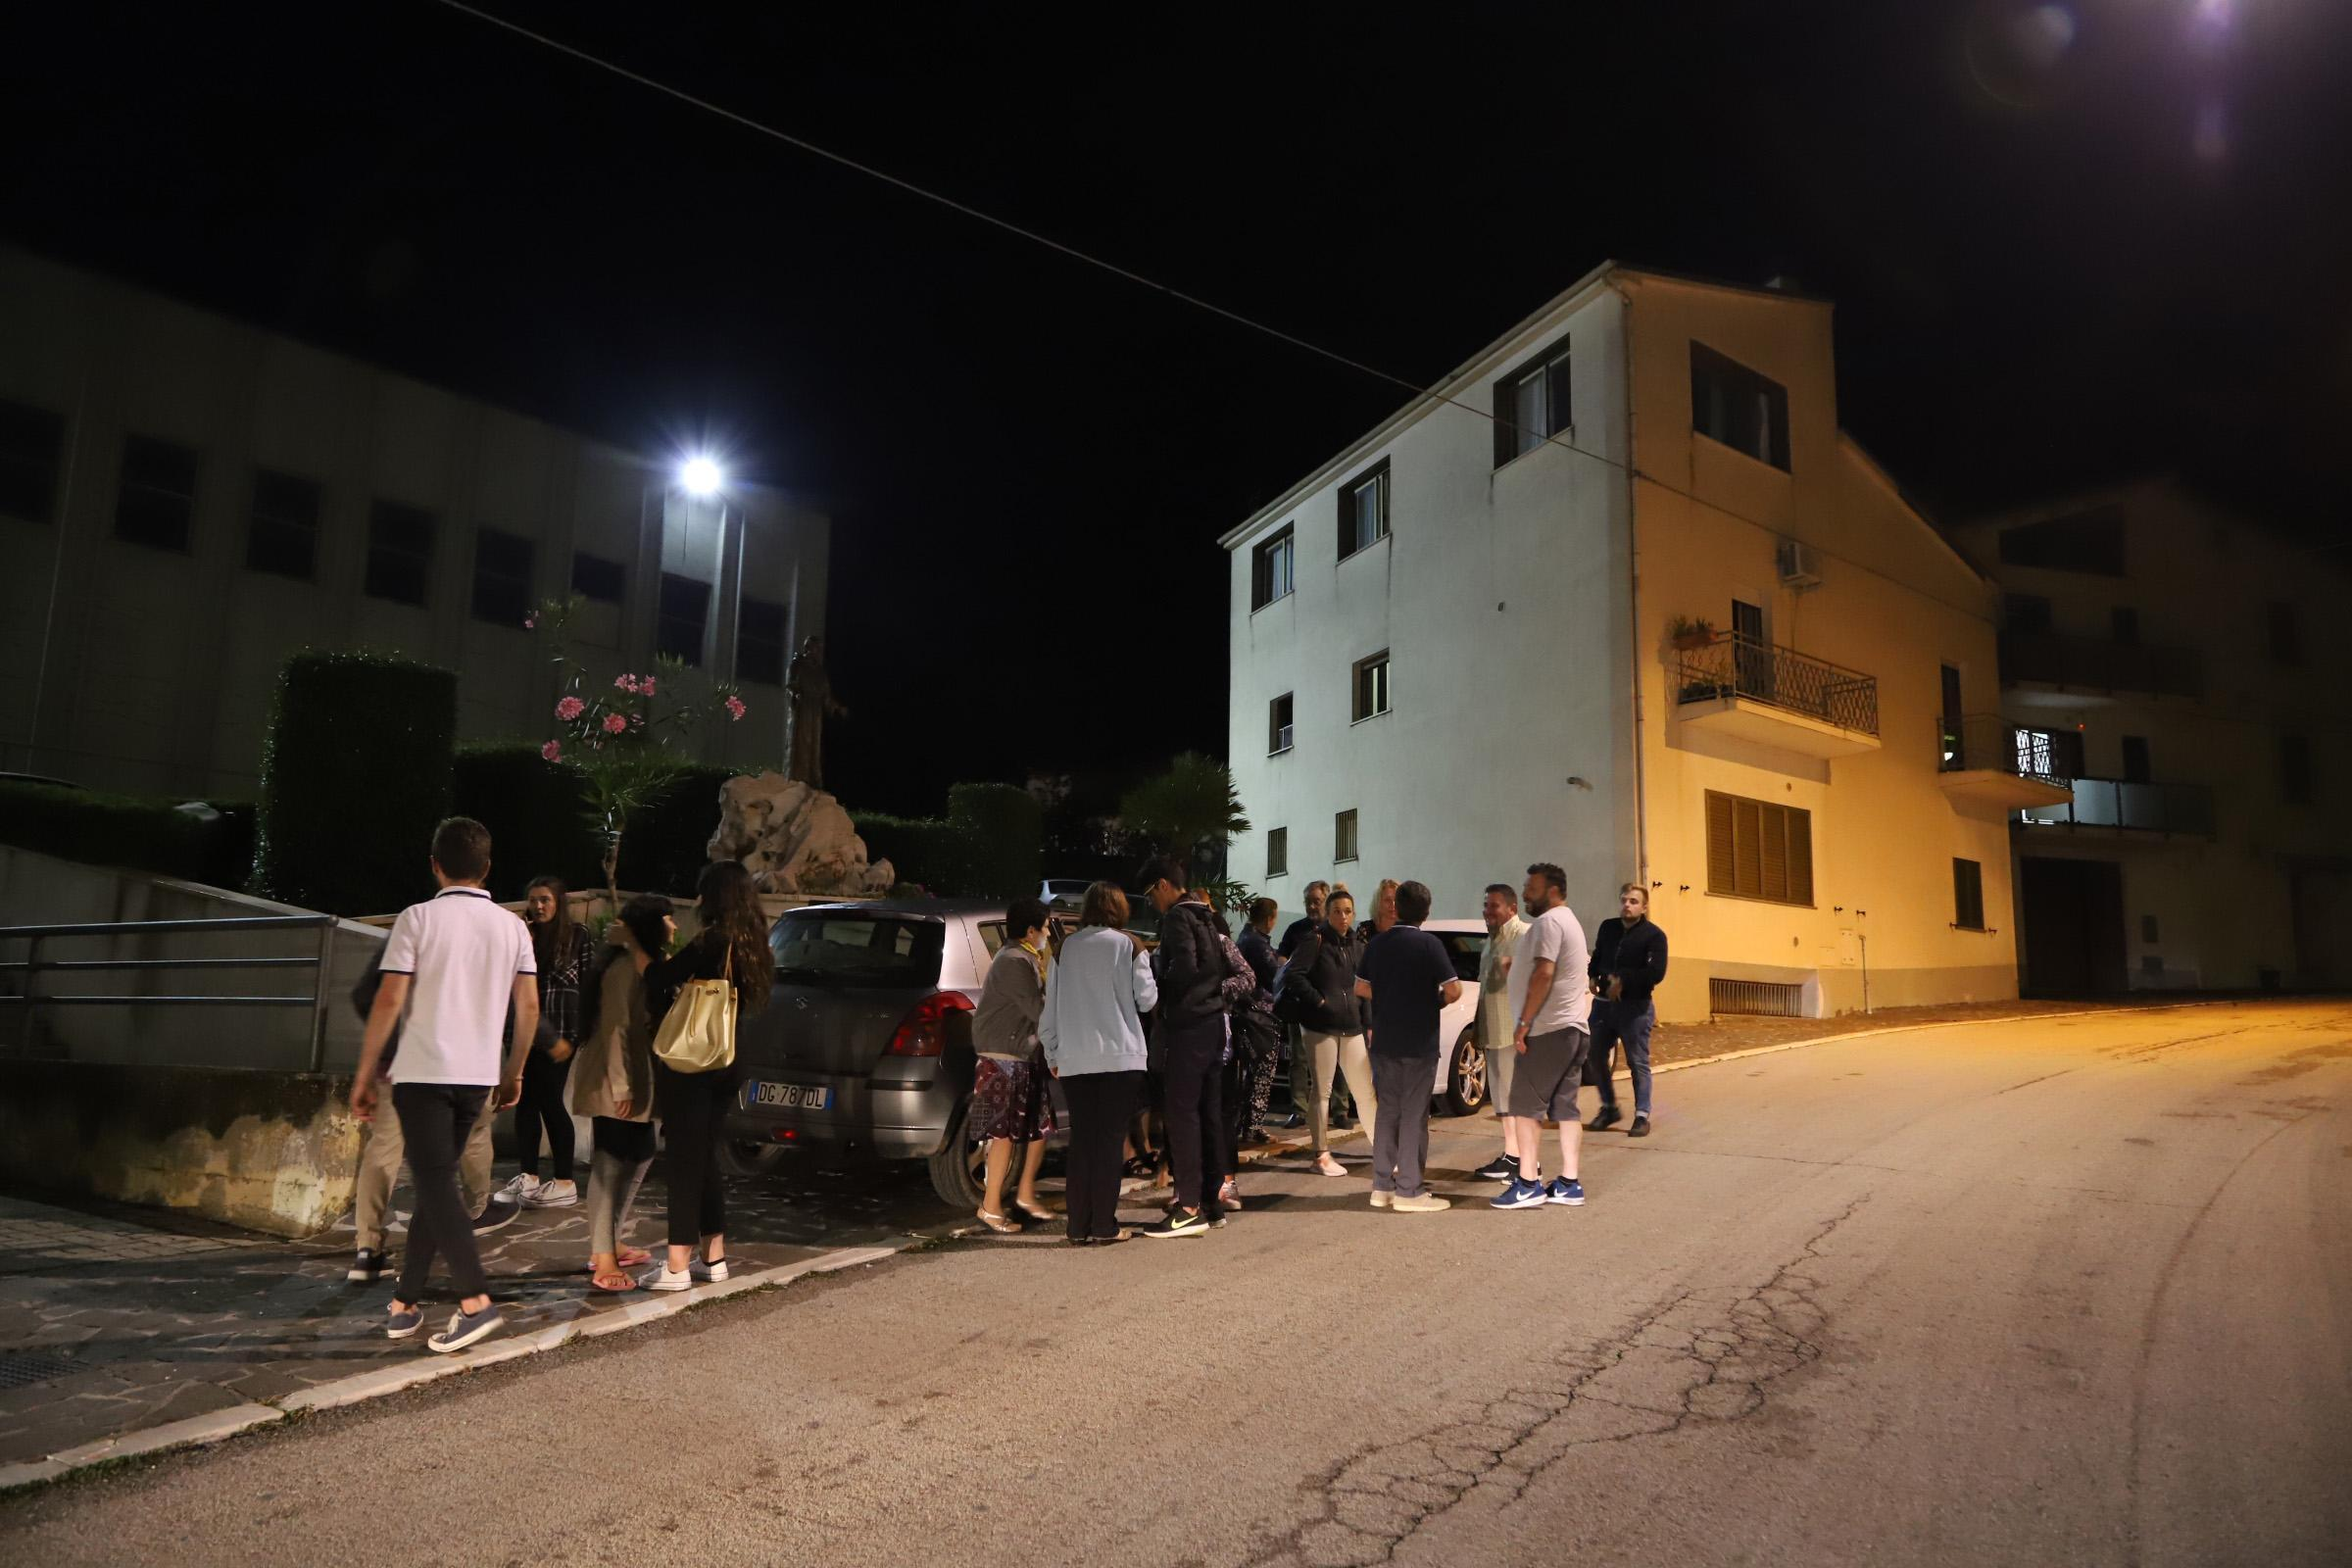 terremoto-molise-gente-per-strada